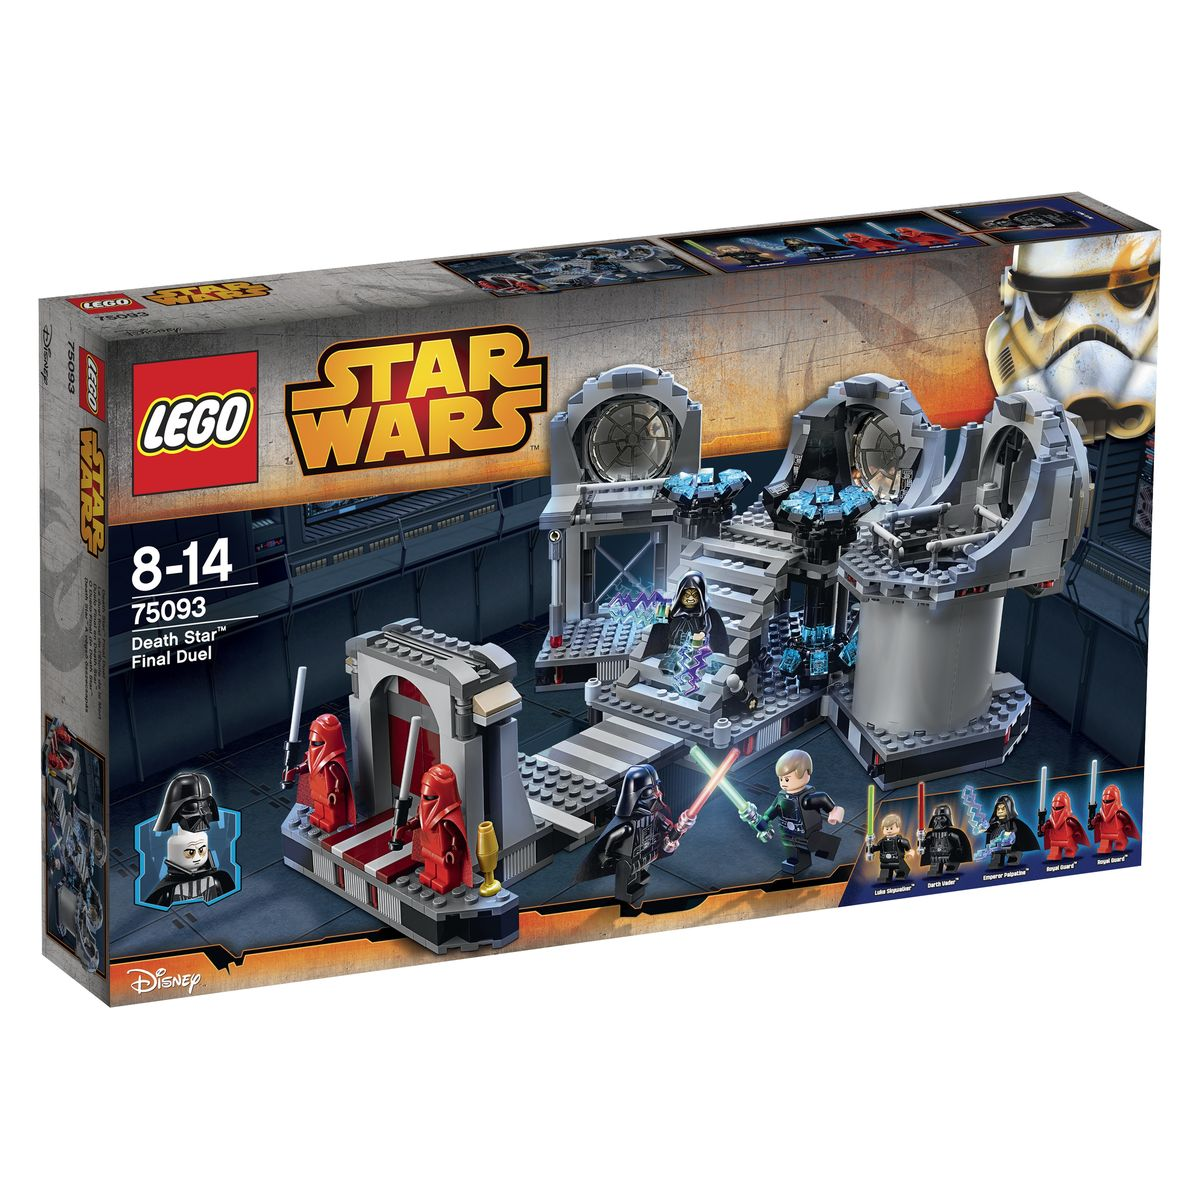 LEGO Star Wars Конструктор Звезда Смерти Последняя схватка 75093